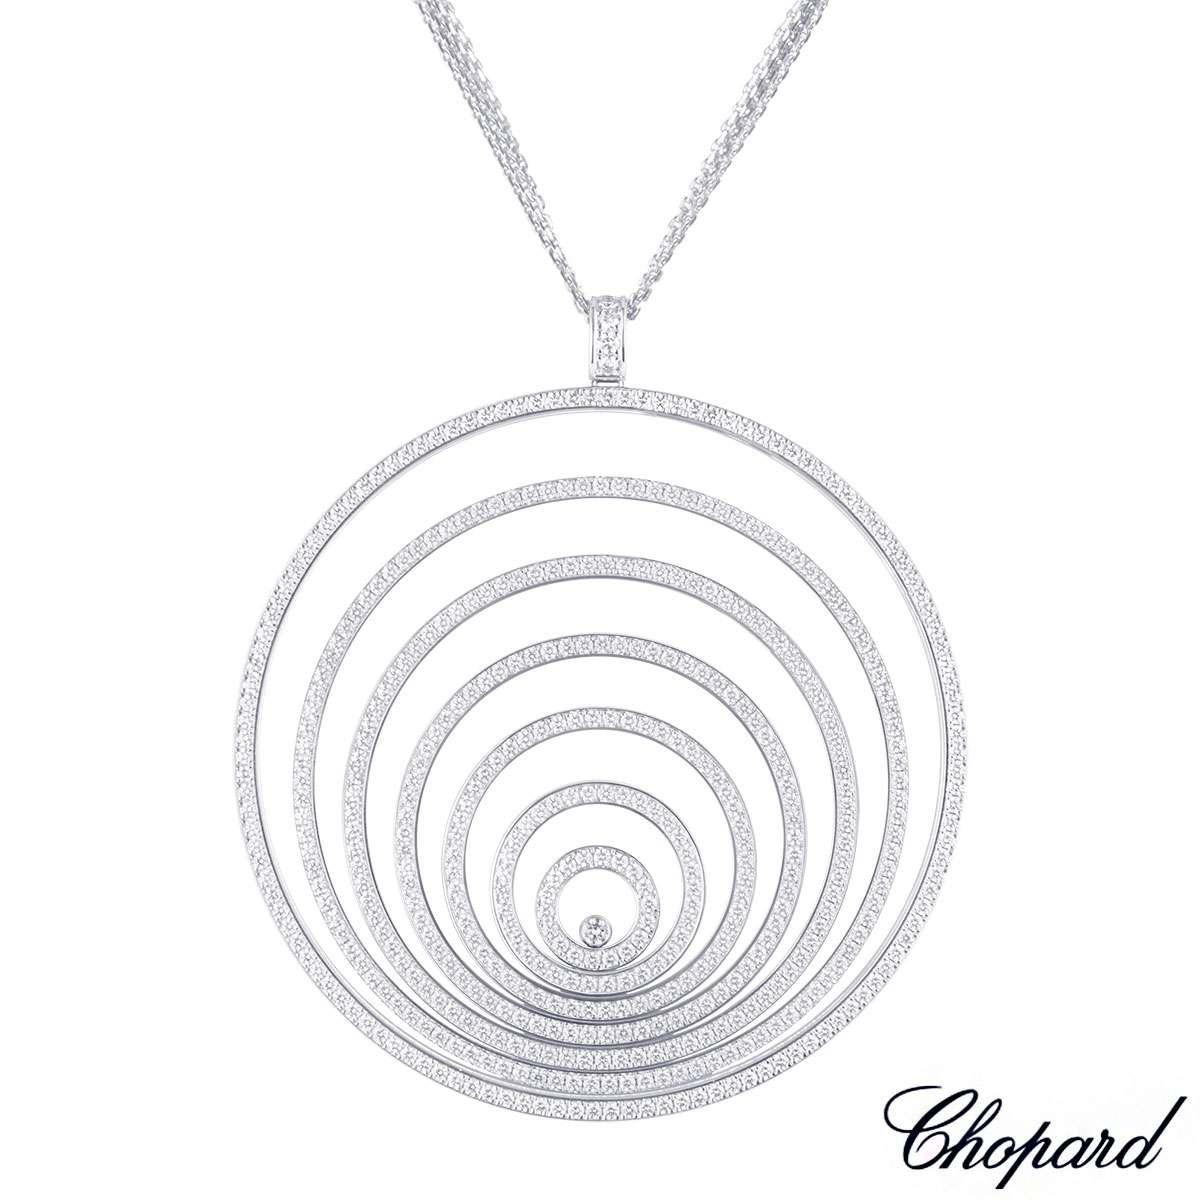 Chopard white gold happy spirit diamond pendant 7957781001 rich chopard white gold happy spirit diamond pendant 7957781001 aloadofball Image collections